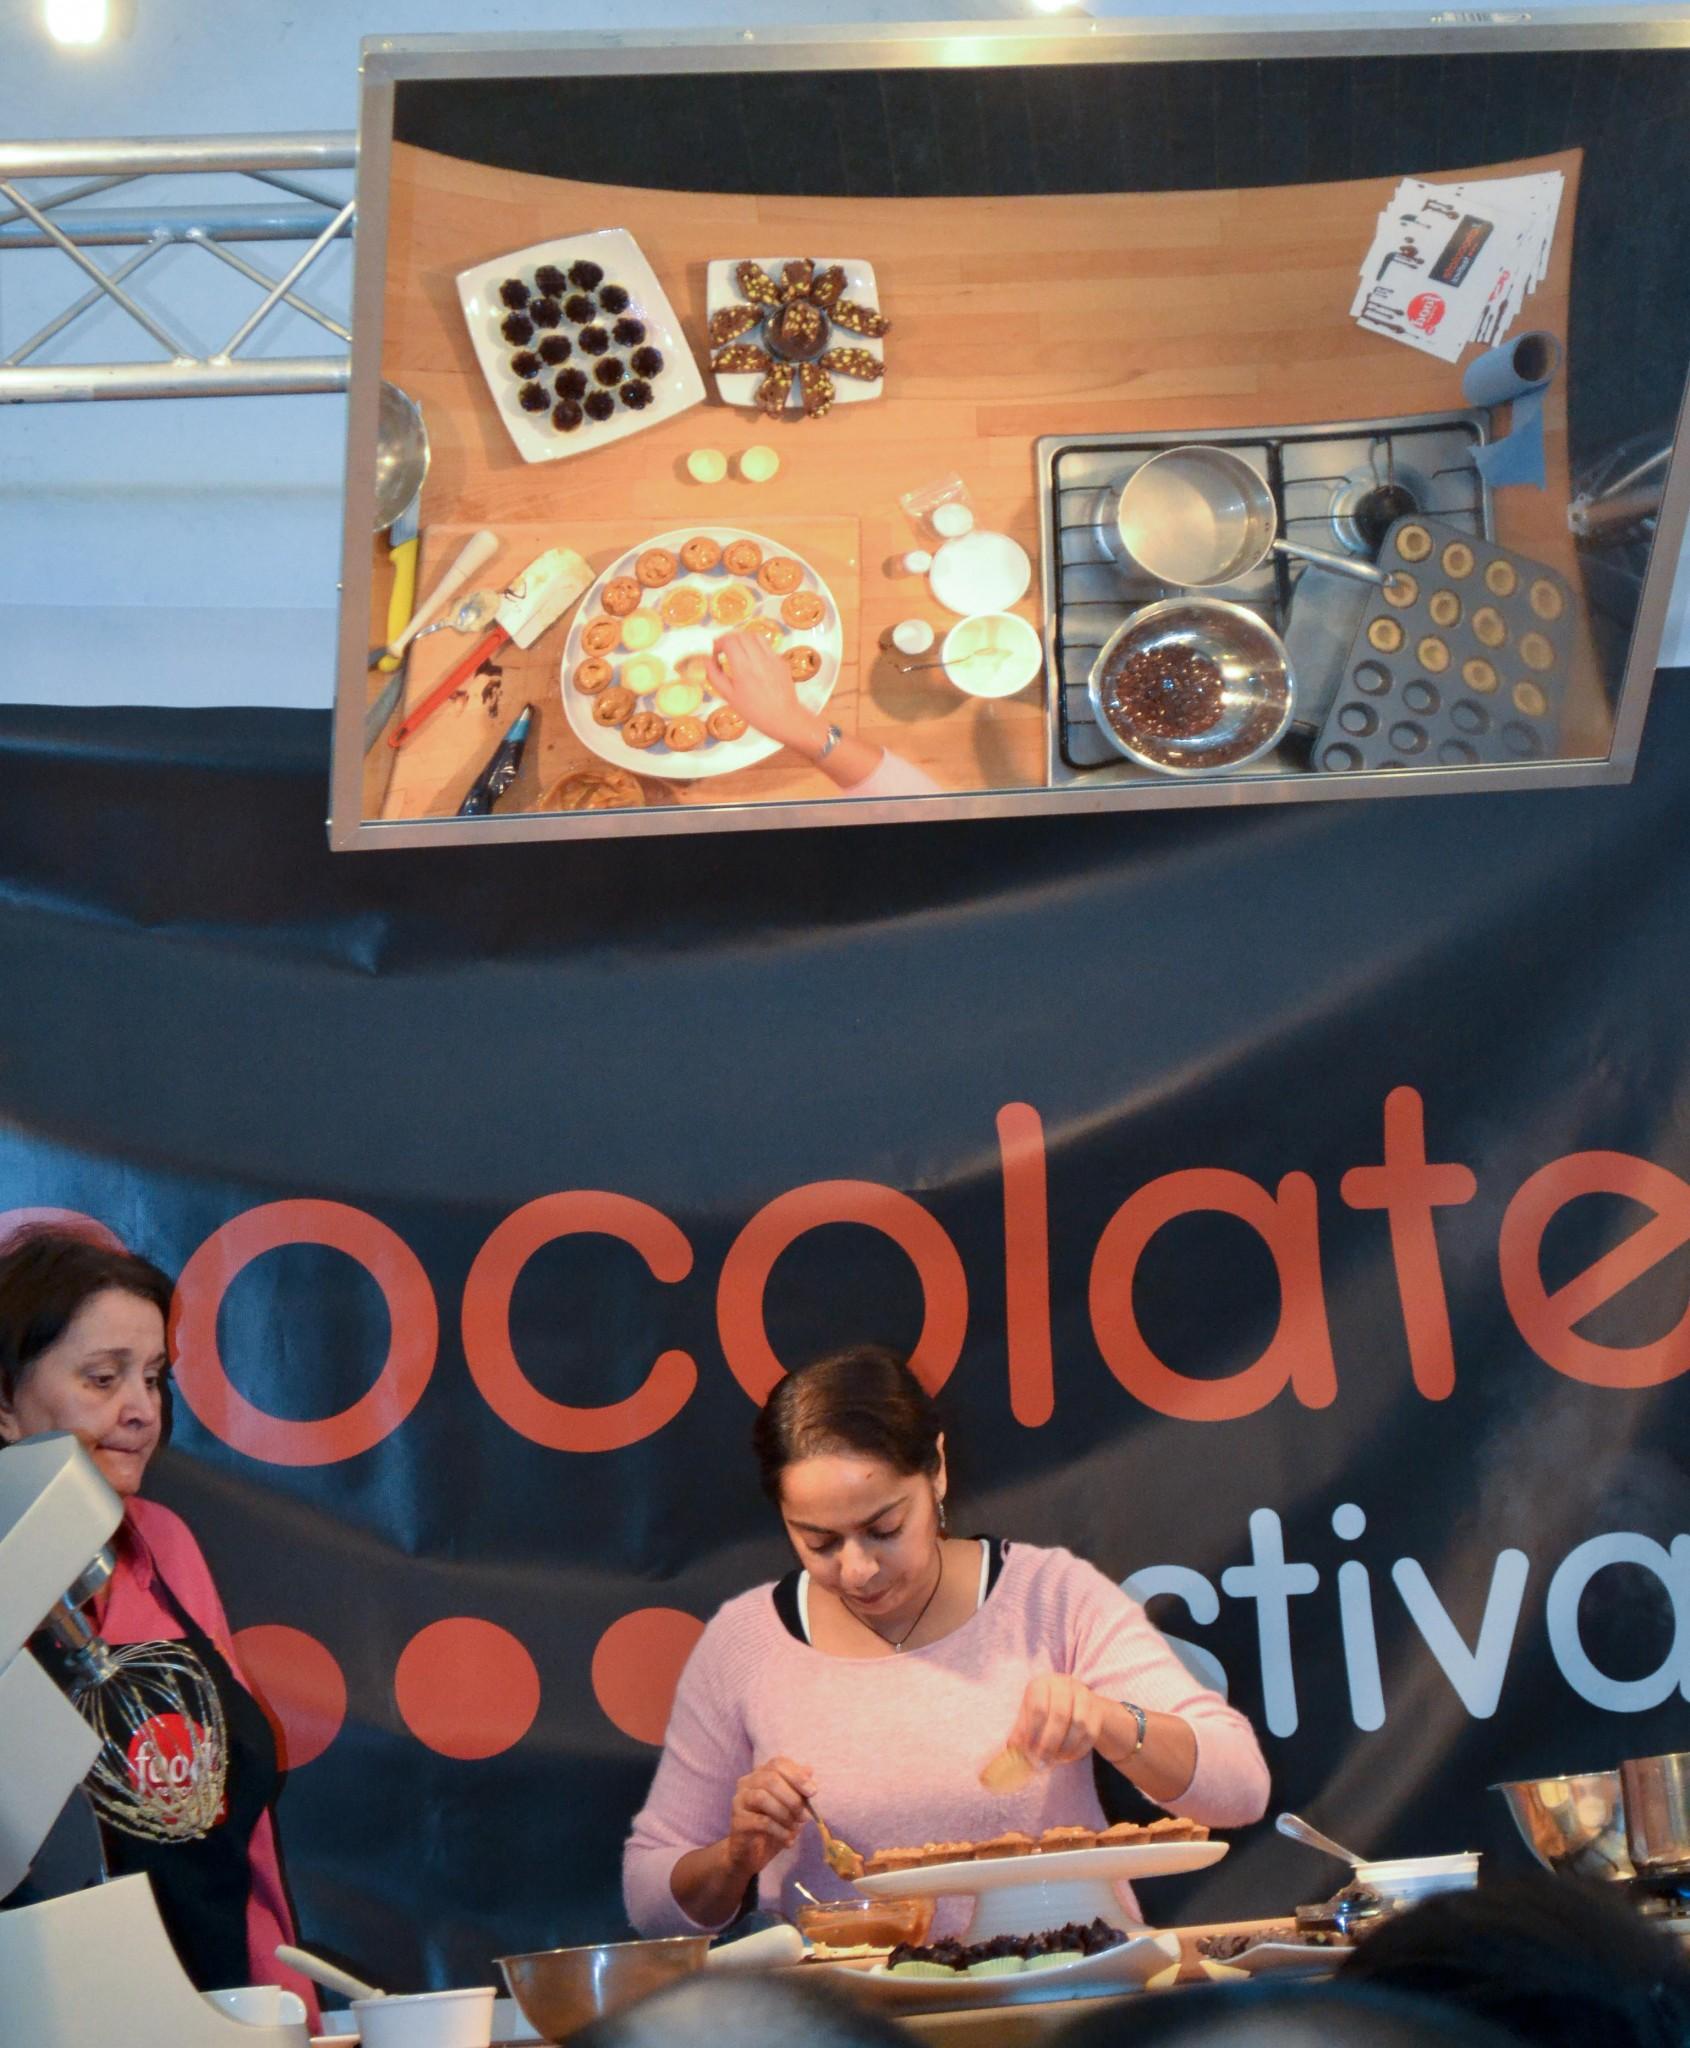 London Chocolate Festival 11 Dec 2011